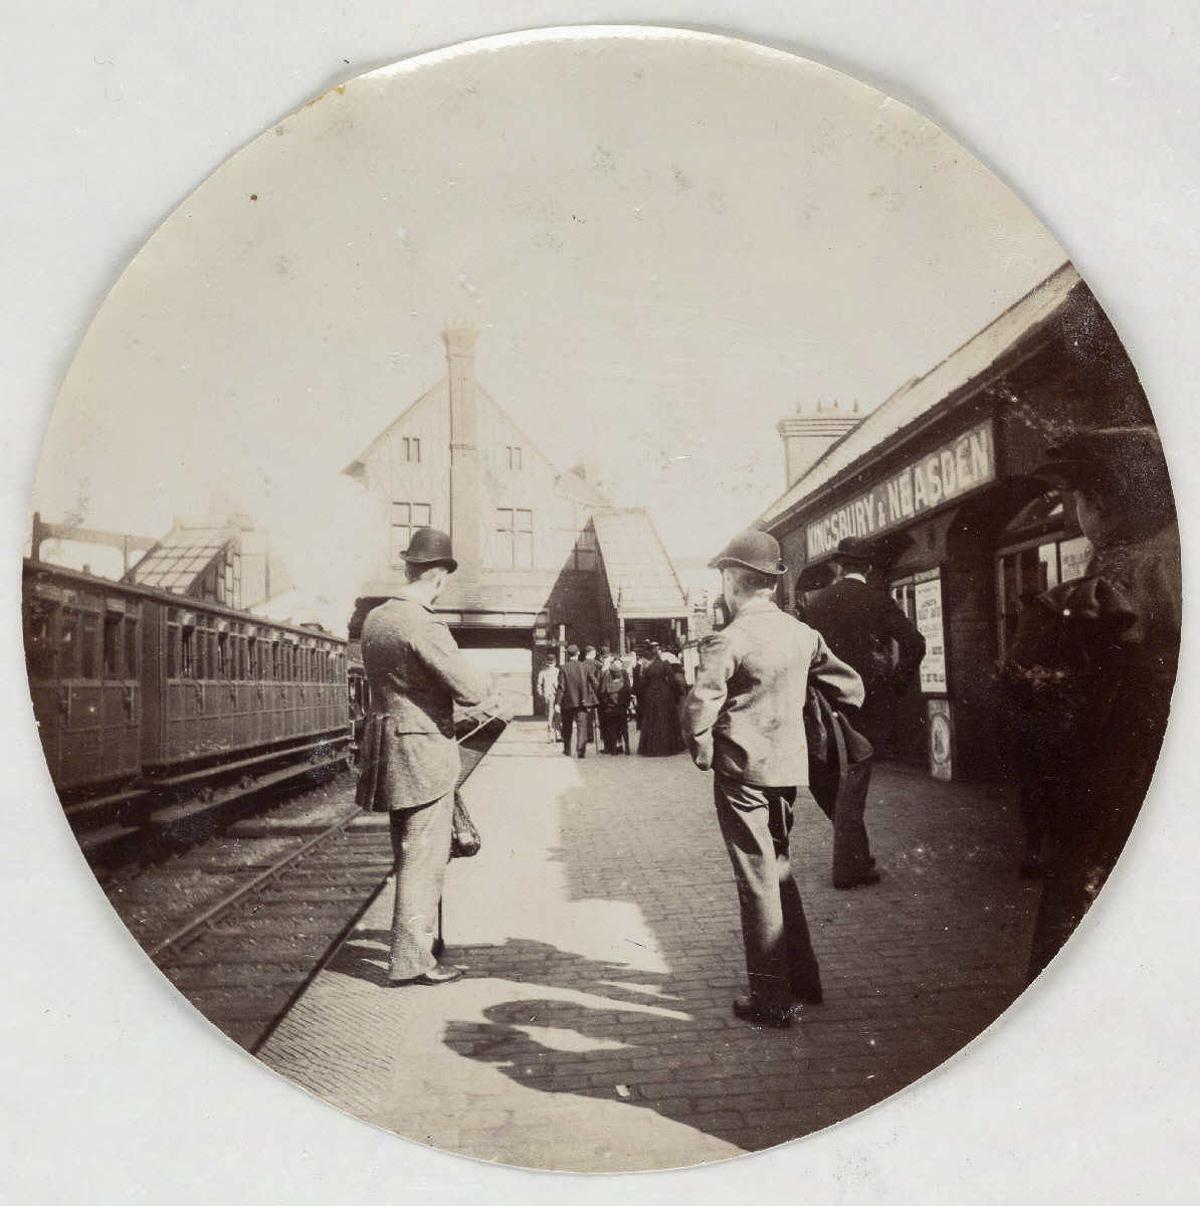 pervye snimki s fotokamery Kodak 11